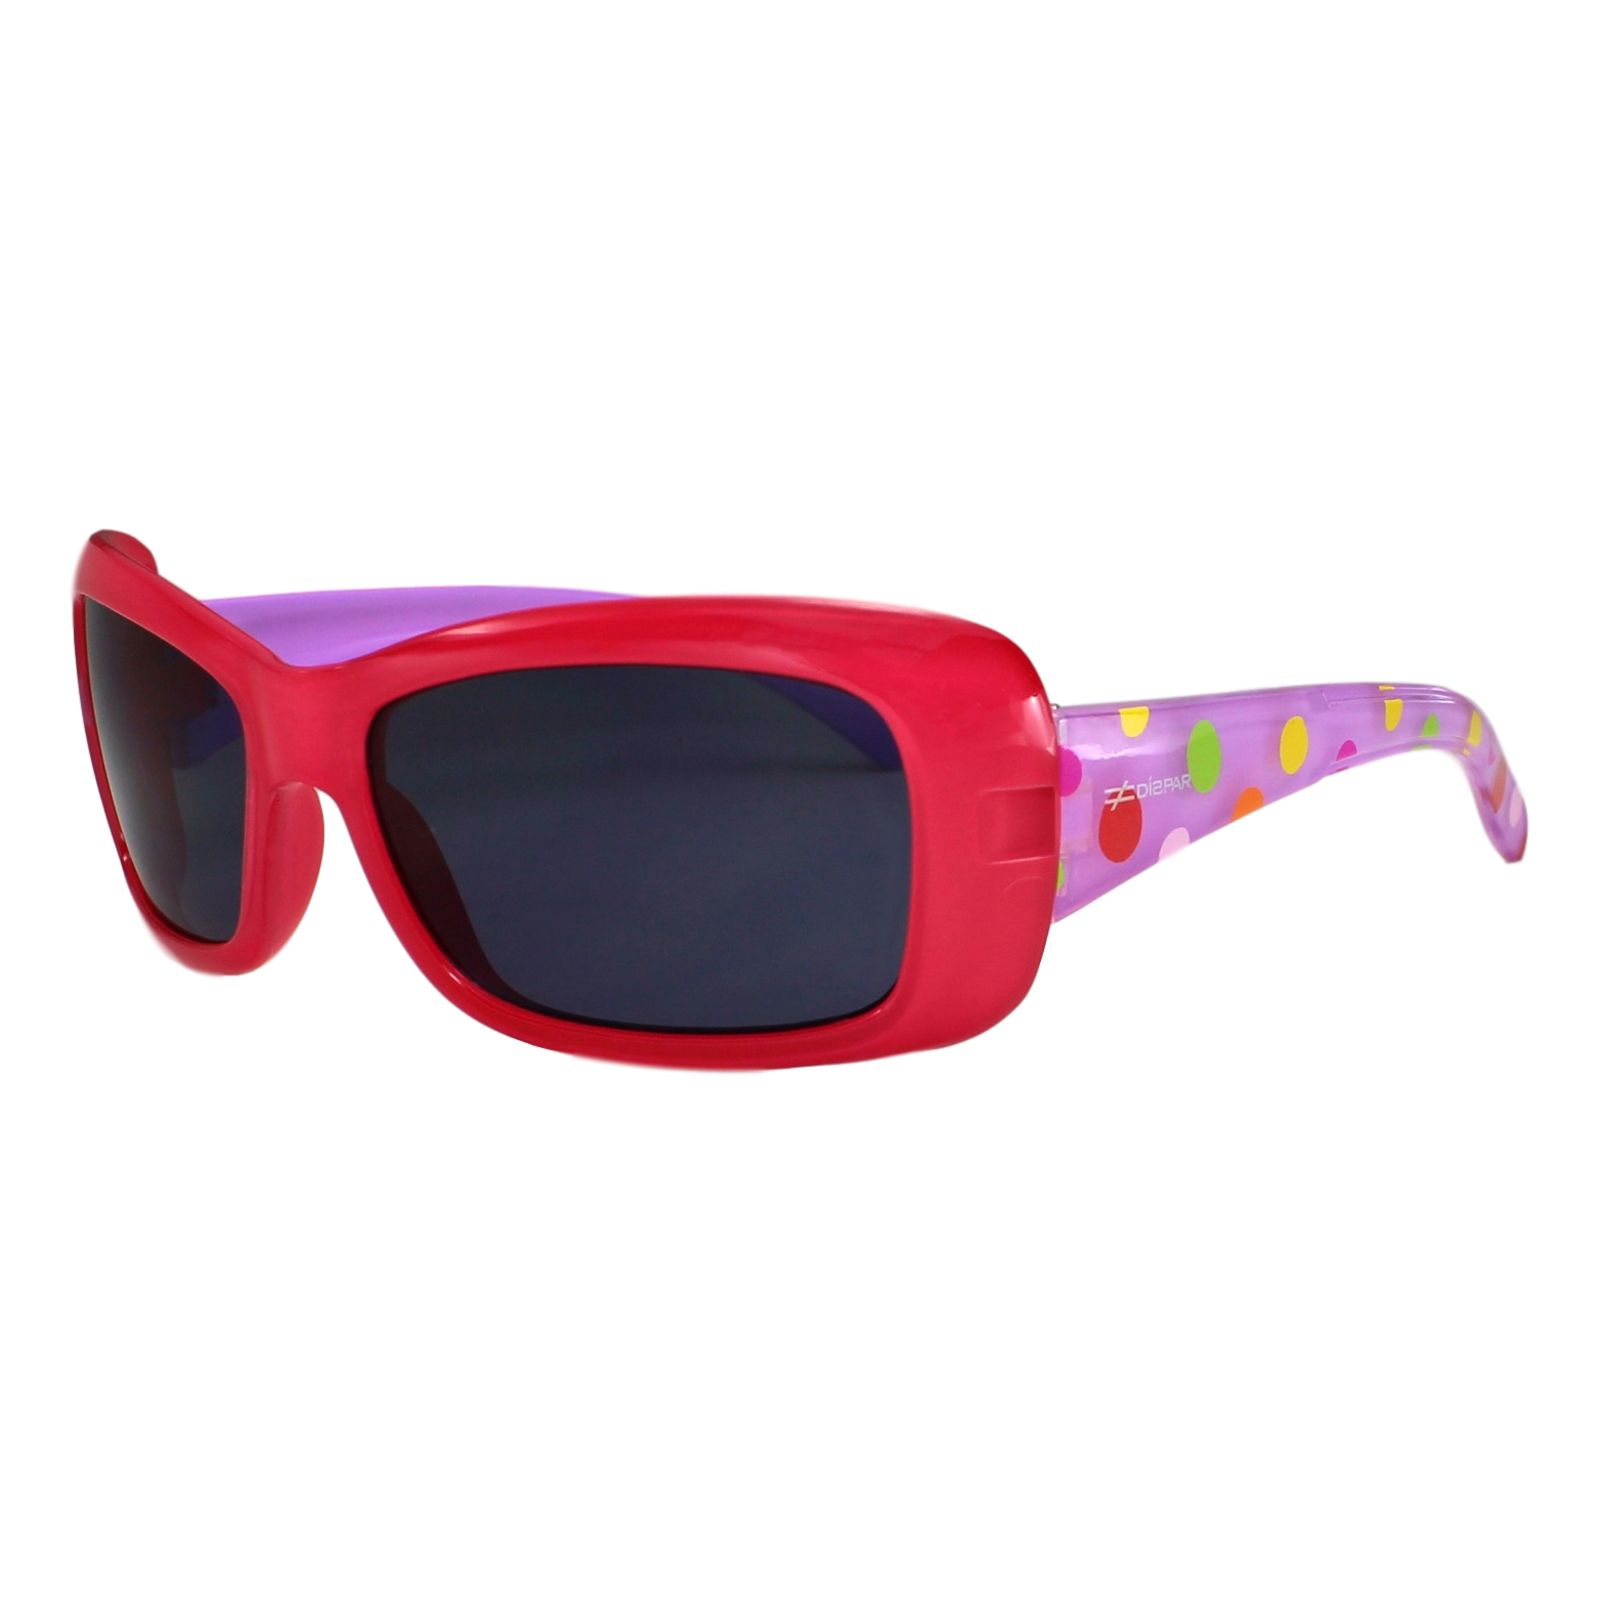 Óculos de Sol Díspar ID1734 infantil - Vermelho